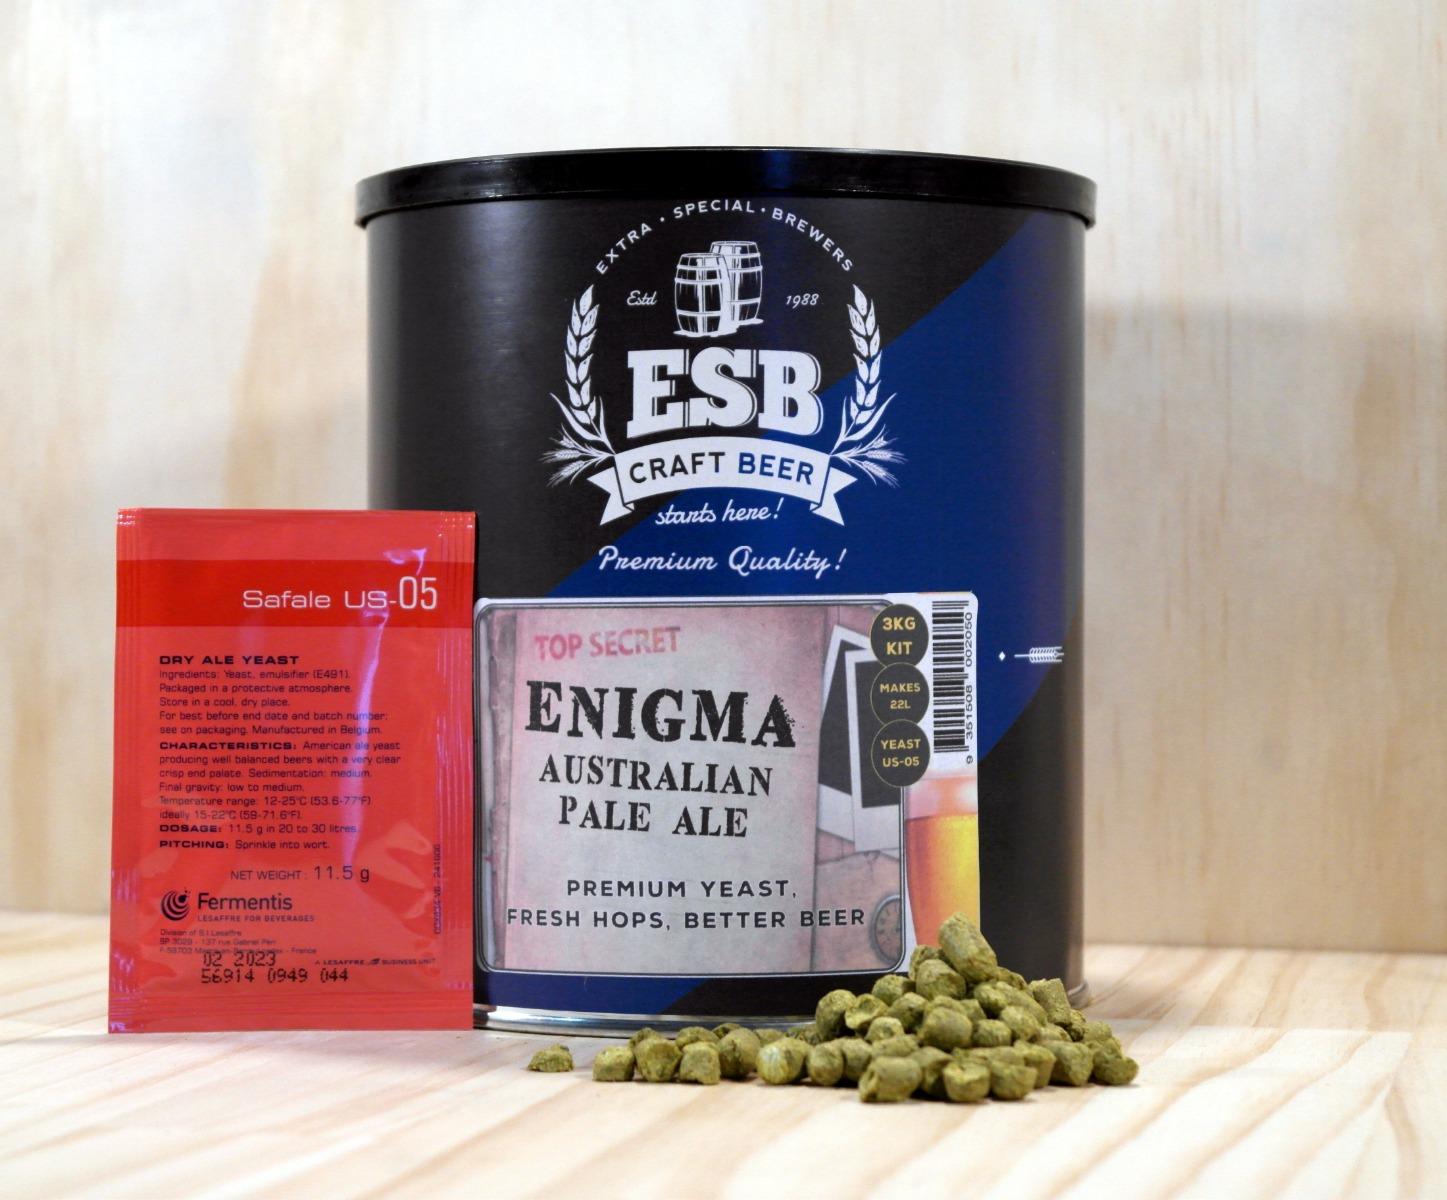 ESB 3kg Enigma Pale Ale